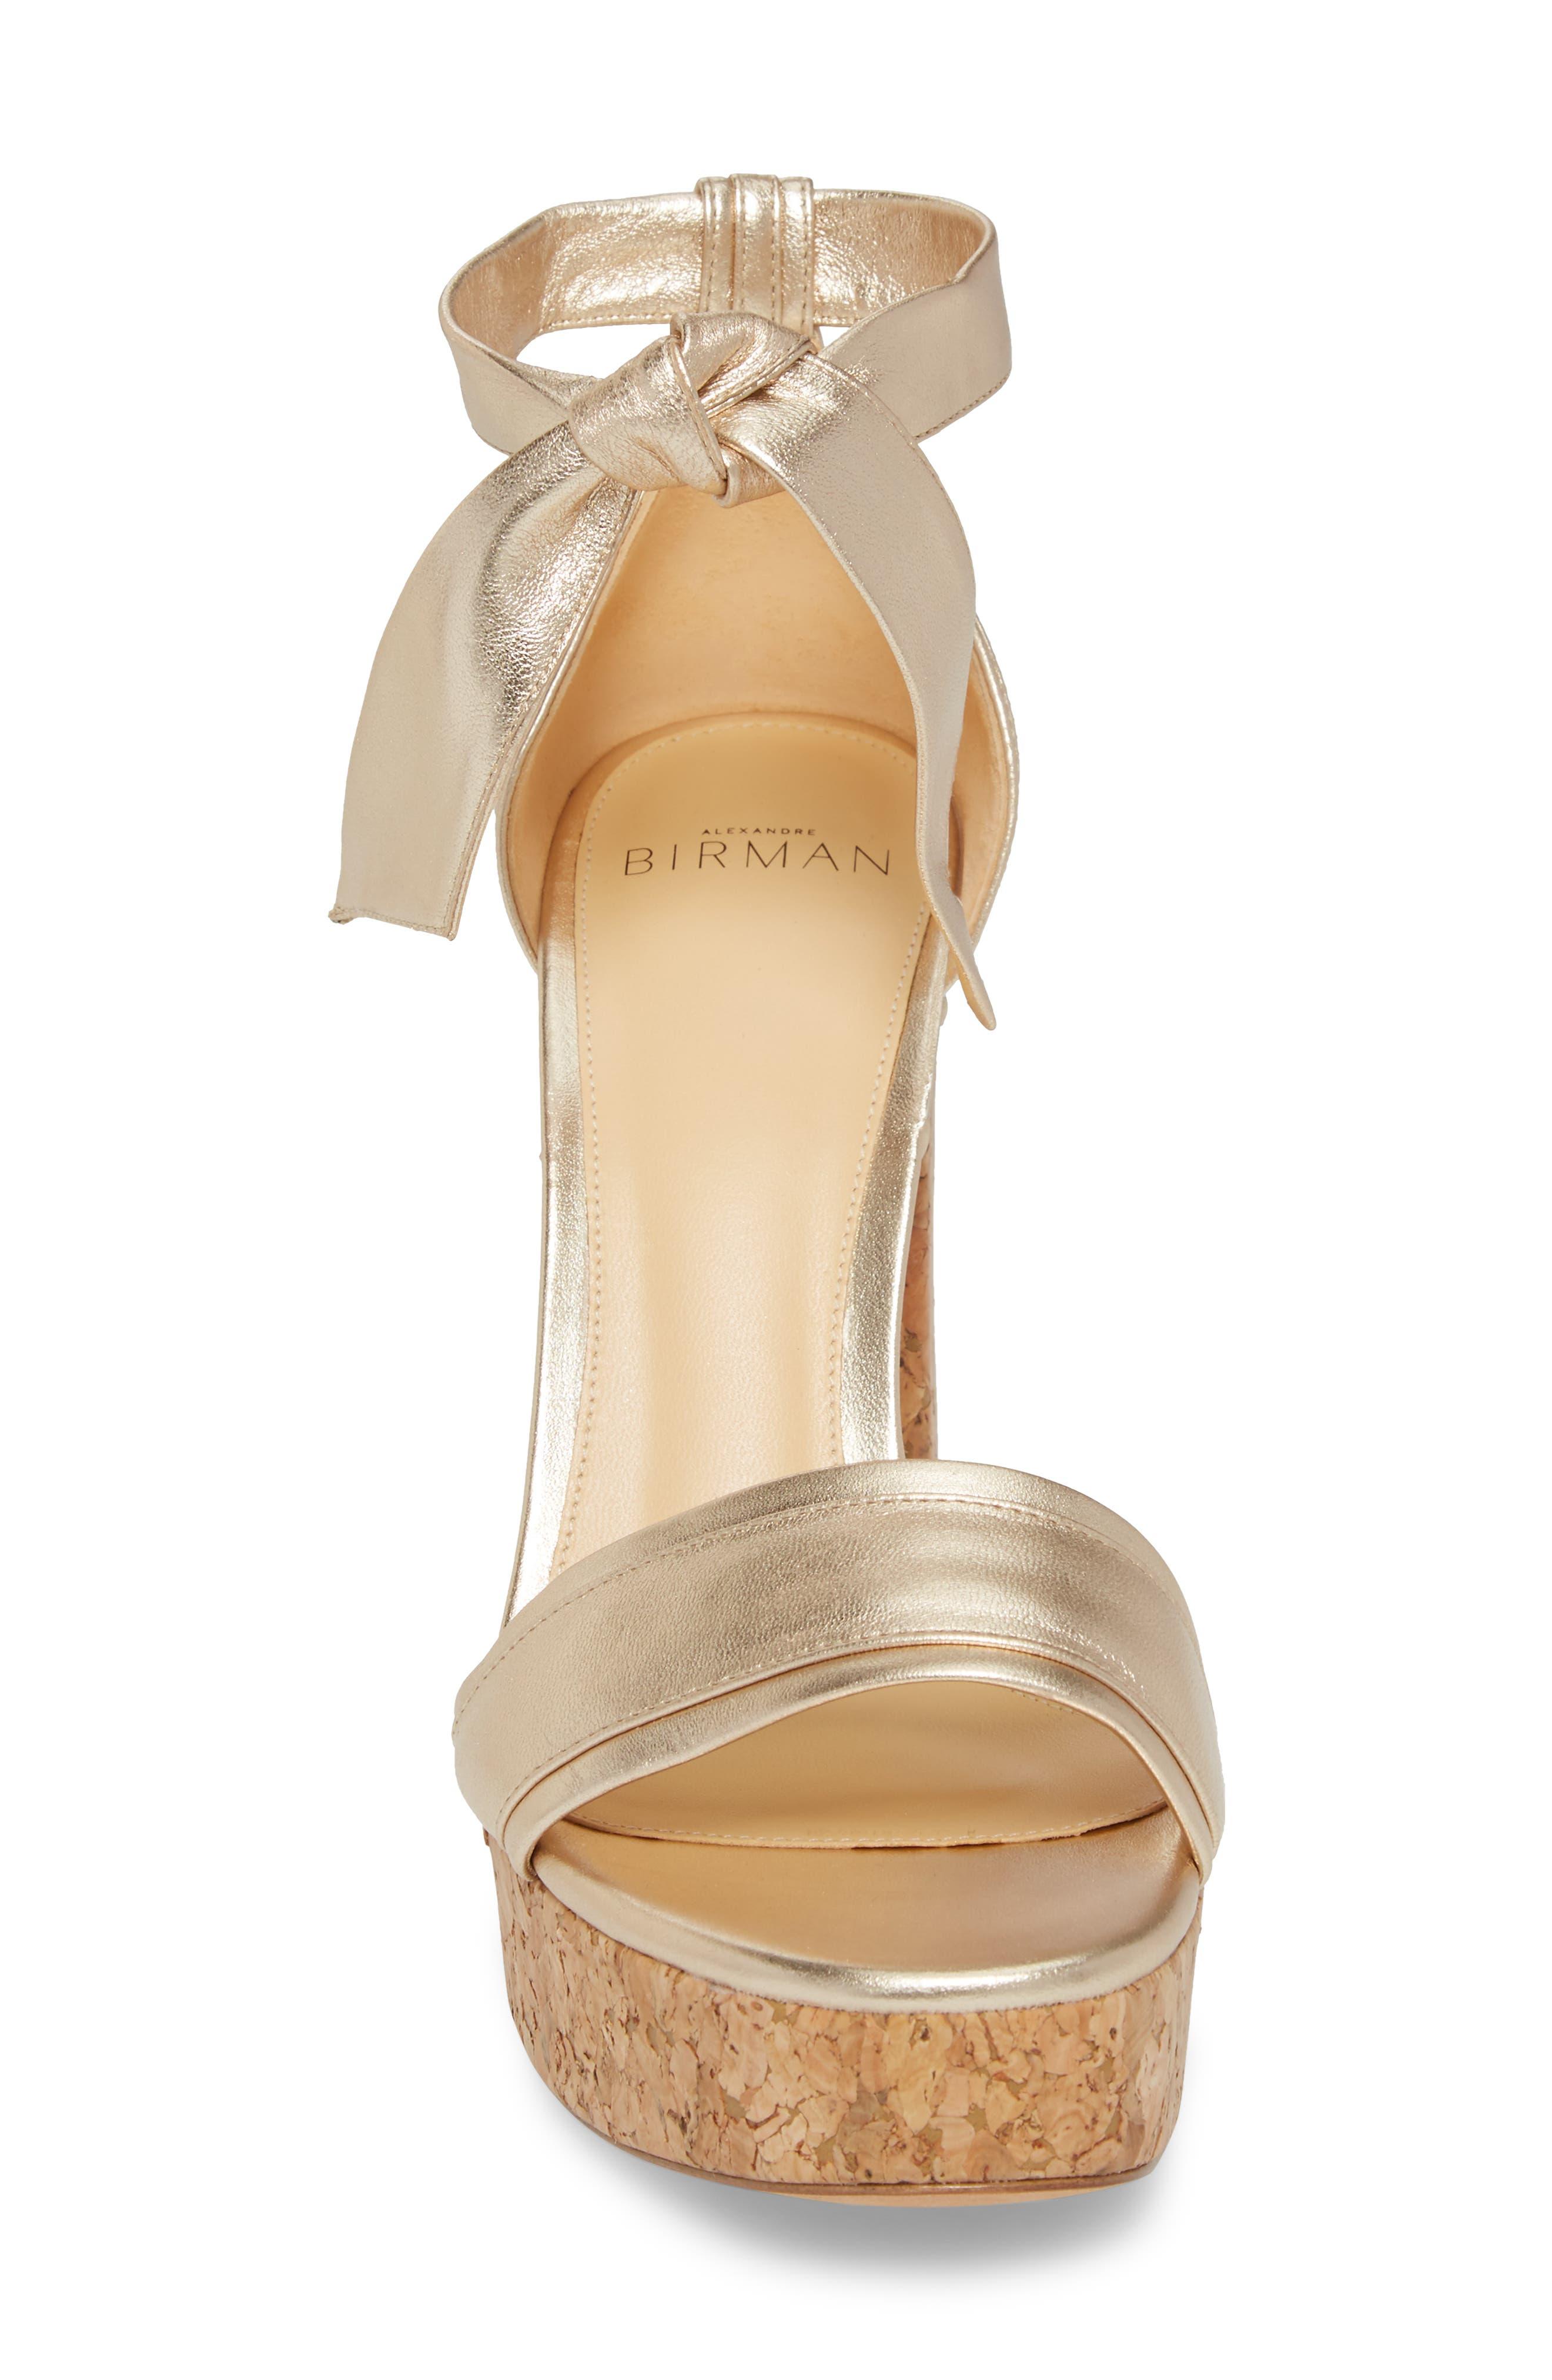 Celine Ankle Tie Platform Sandal,                             Alternate thumbnail 4, color,                             Gold